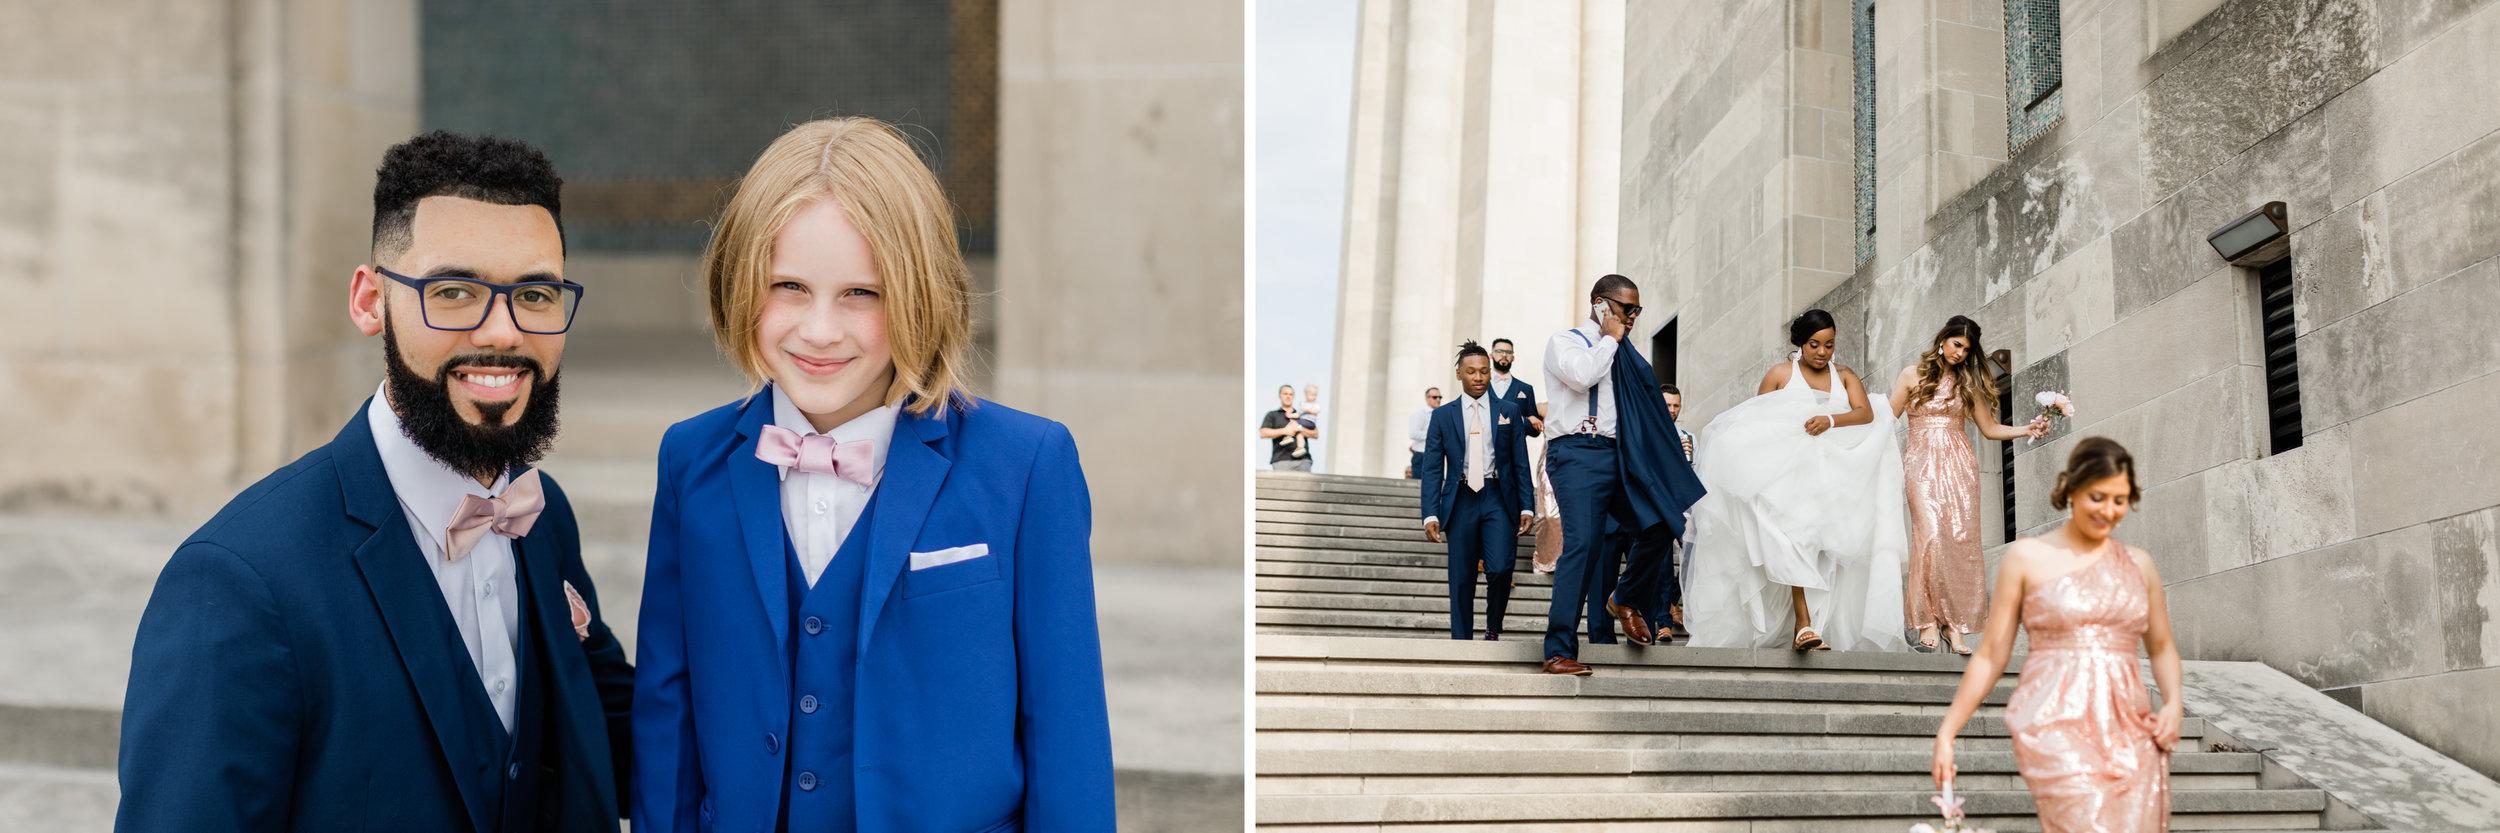 Kansas City Wedding Photographer 49.jpg